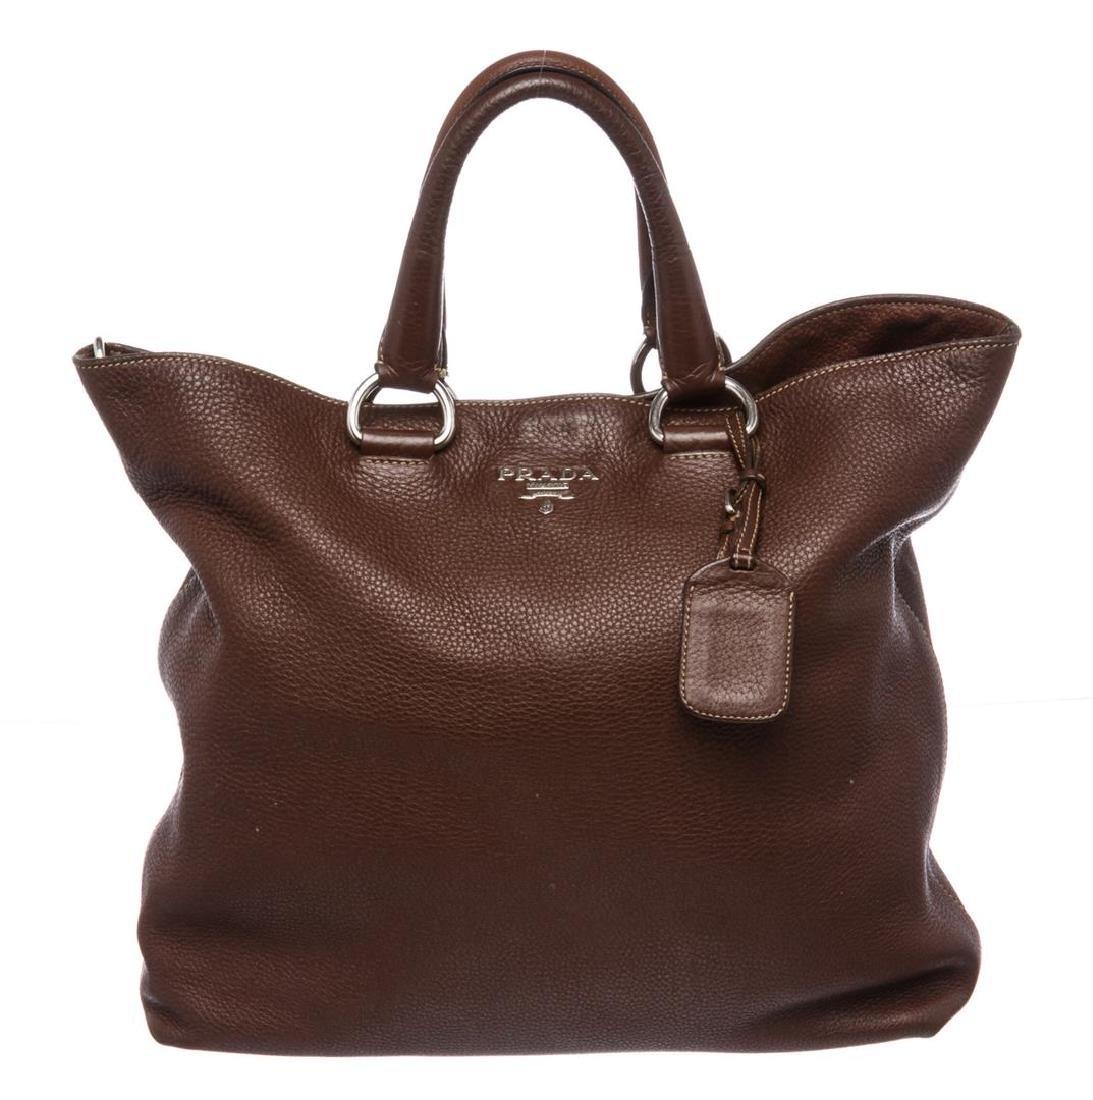 Prada Brown Pebbled Leather Tote Satchel Bag